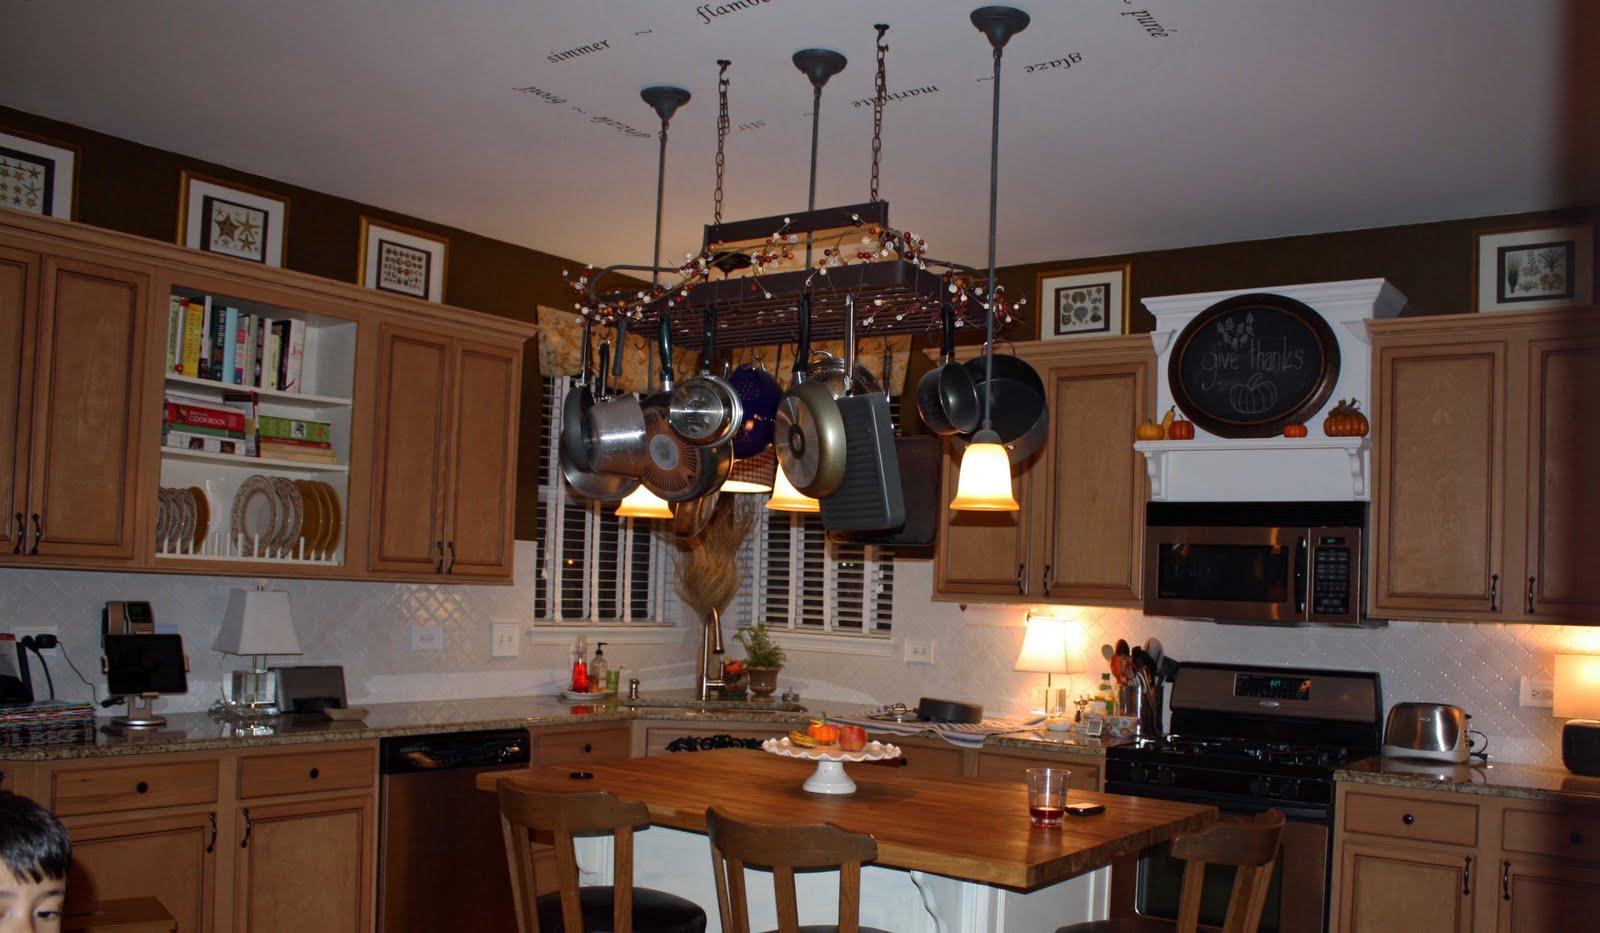 hobby lobby kitchen decor. Black Bedroom Furniture Sets. Home Design Ideas